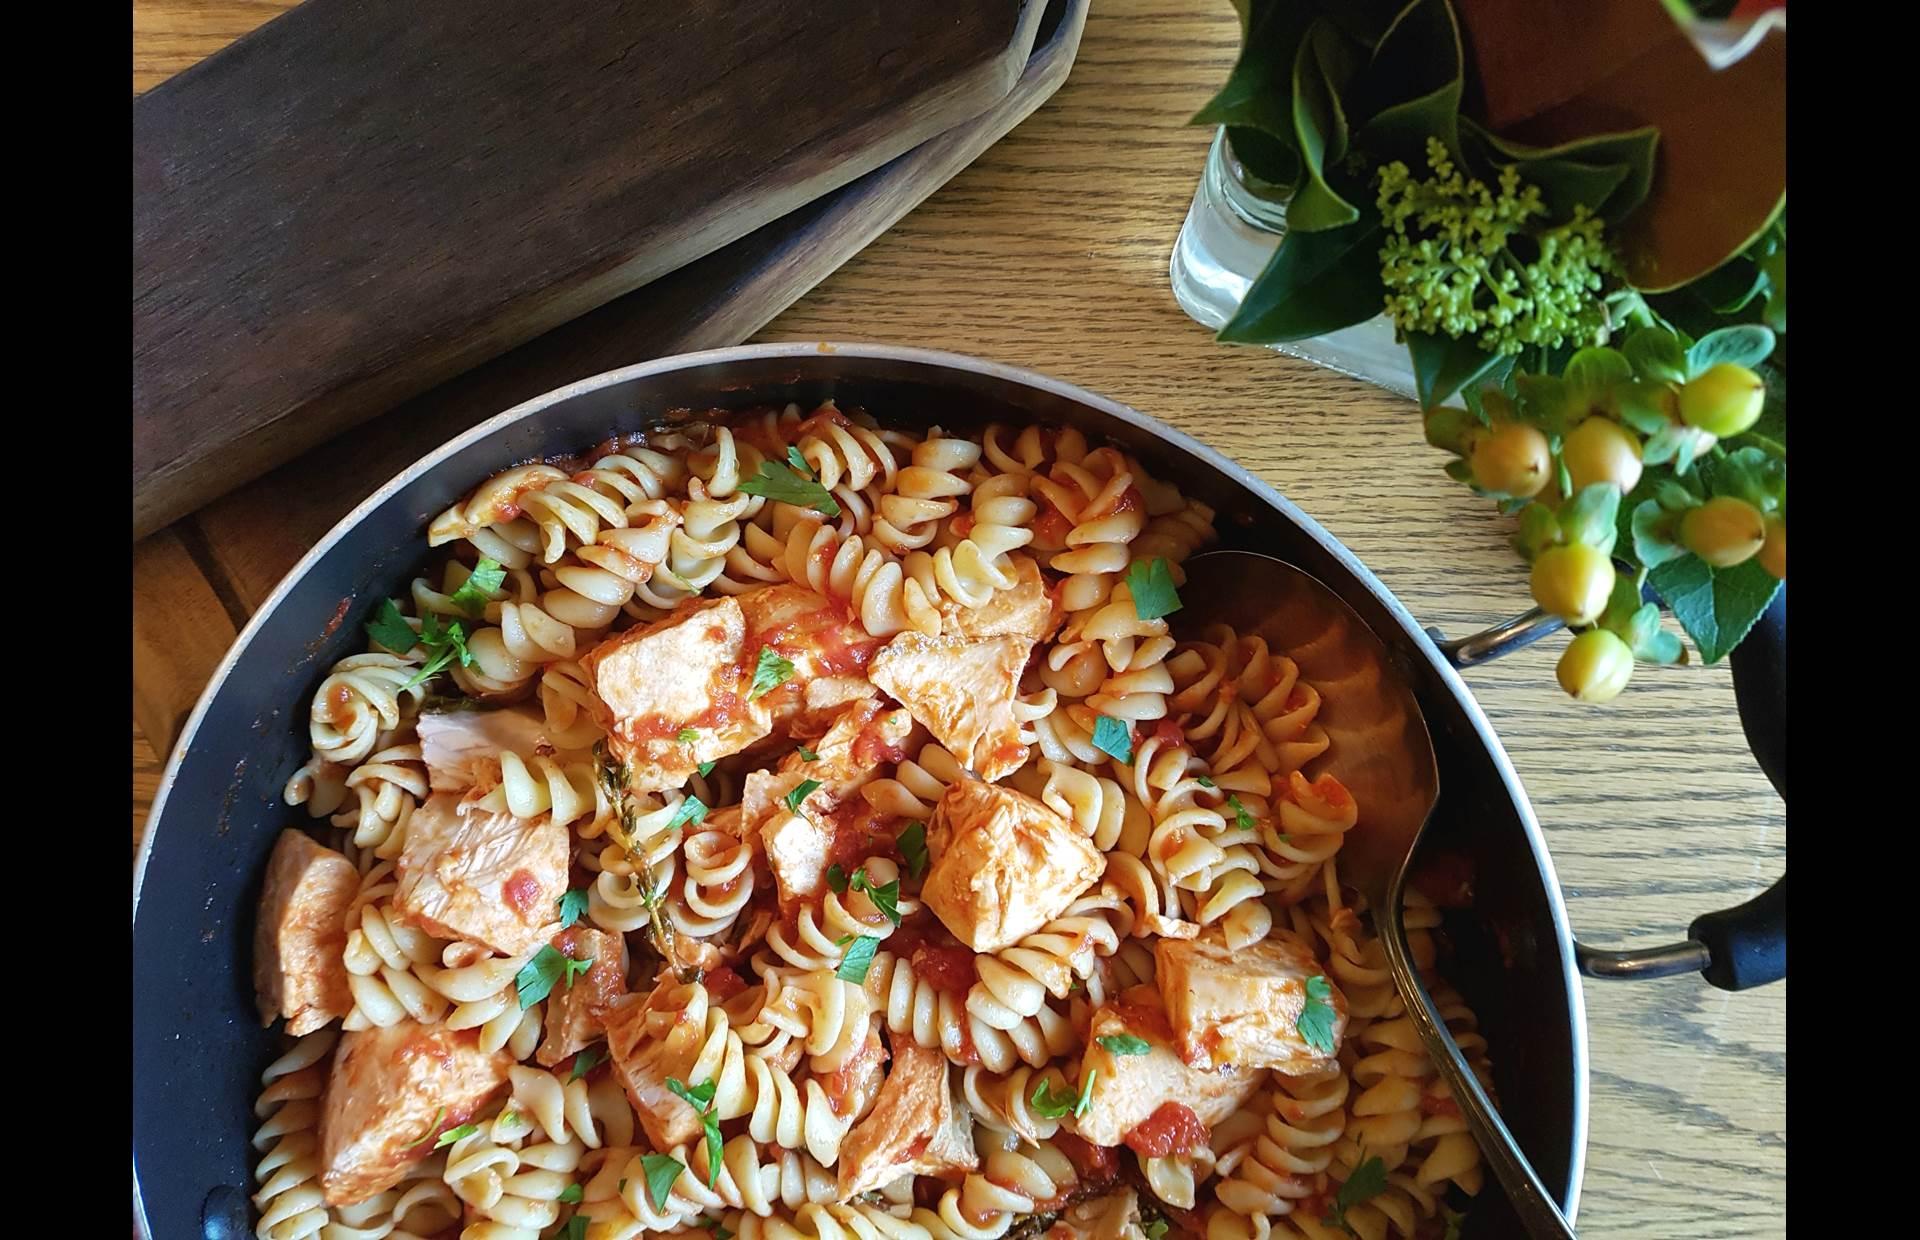 Poêlée de saumon cuit, pâtes fusilli, sauce tomate et persil